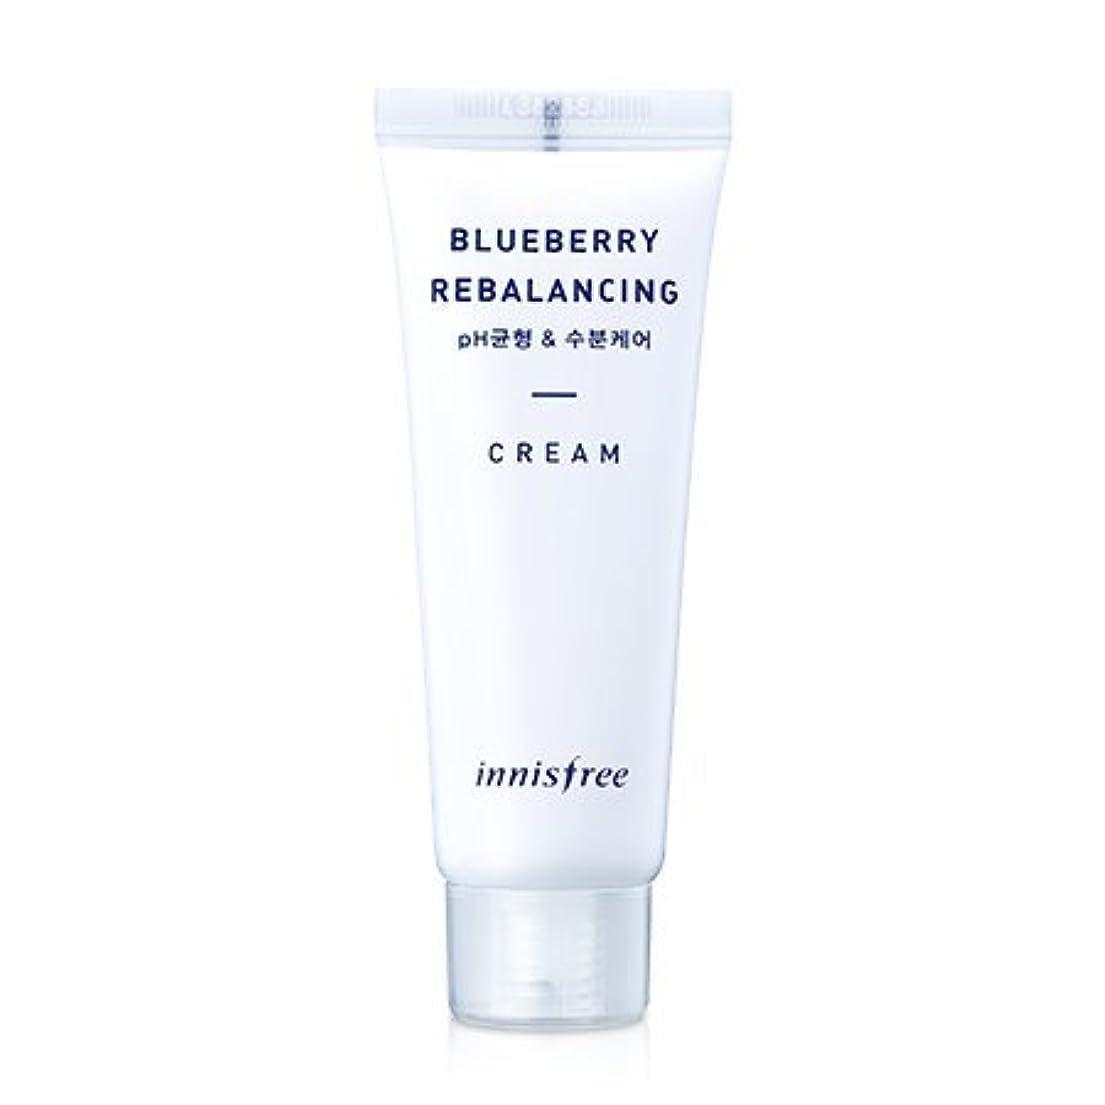 [innisfree(イニスフリー)] Super food_ Blueberry rebalancing cream (50ml) スーパーフード_ブルーベリーリベルロンシンクリーム[並行輸入品][海外直送品]